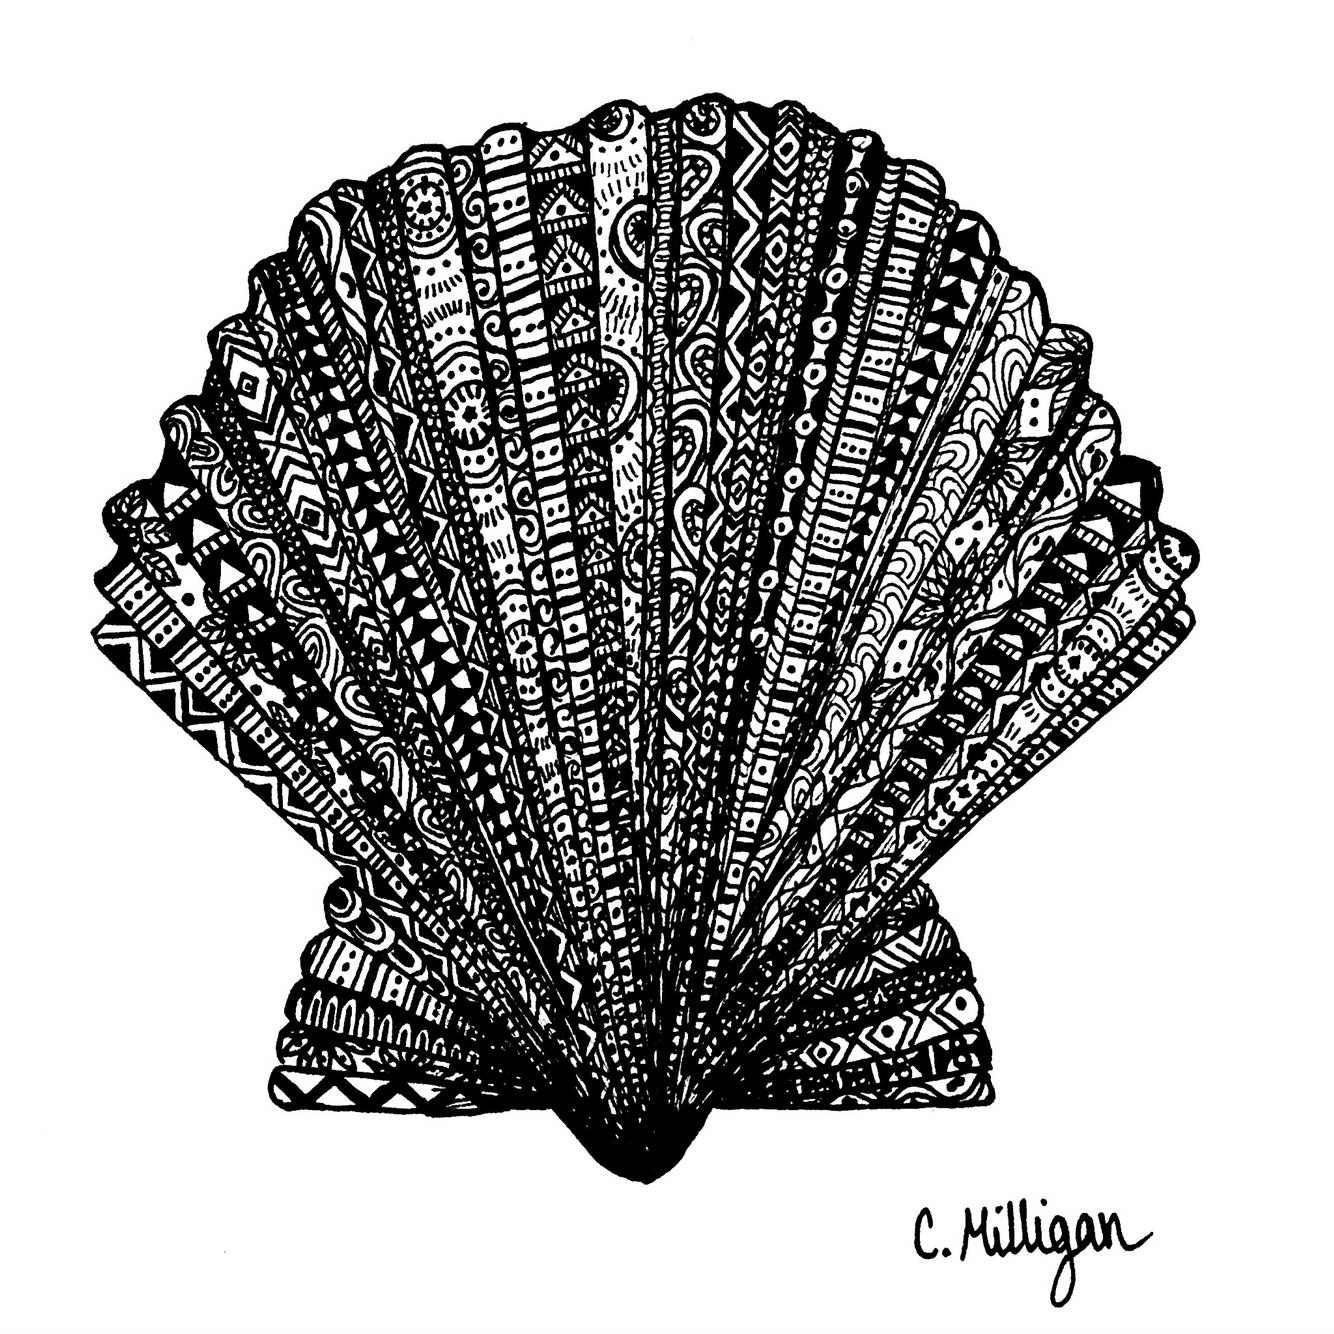 1334x1334 Scallop Shell Zentangle Drawing By Sea Milligan Designs Seashell